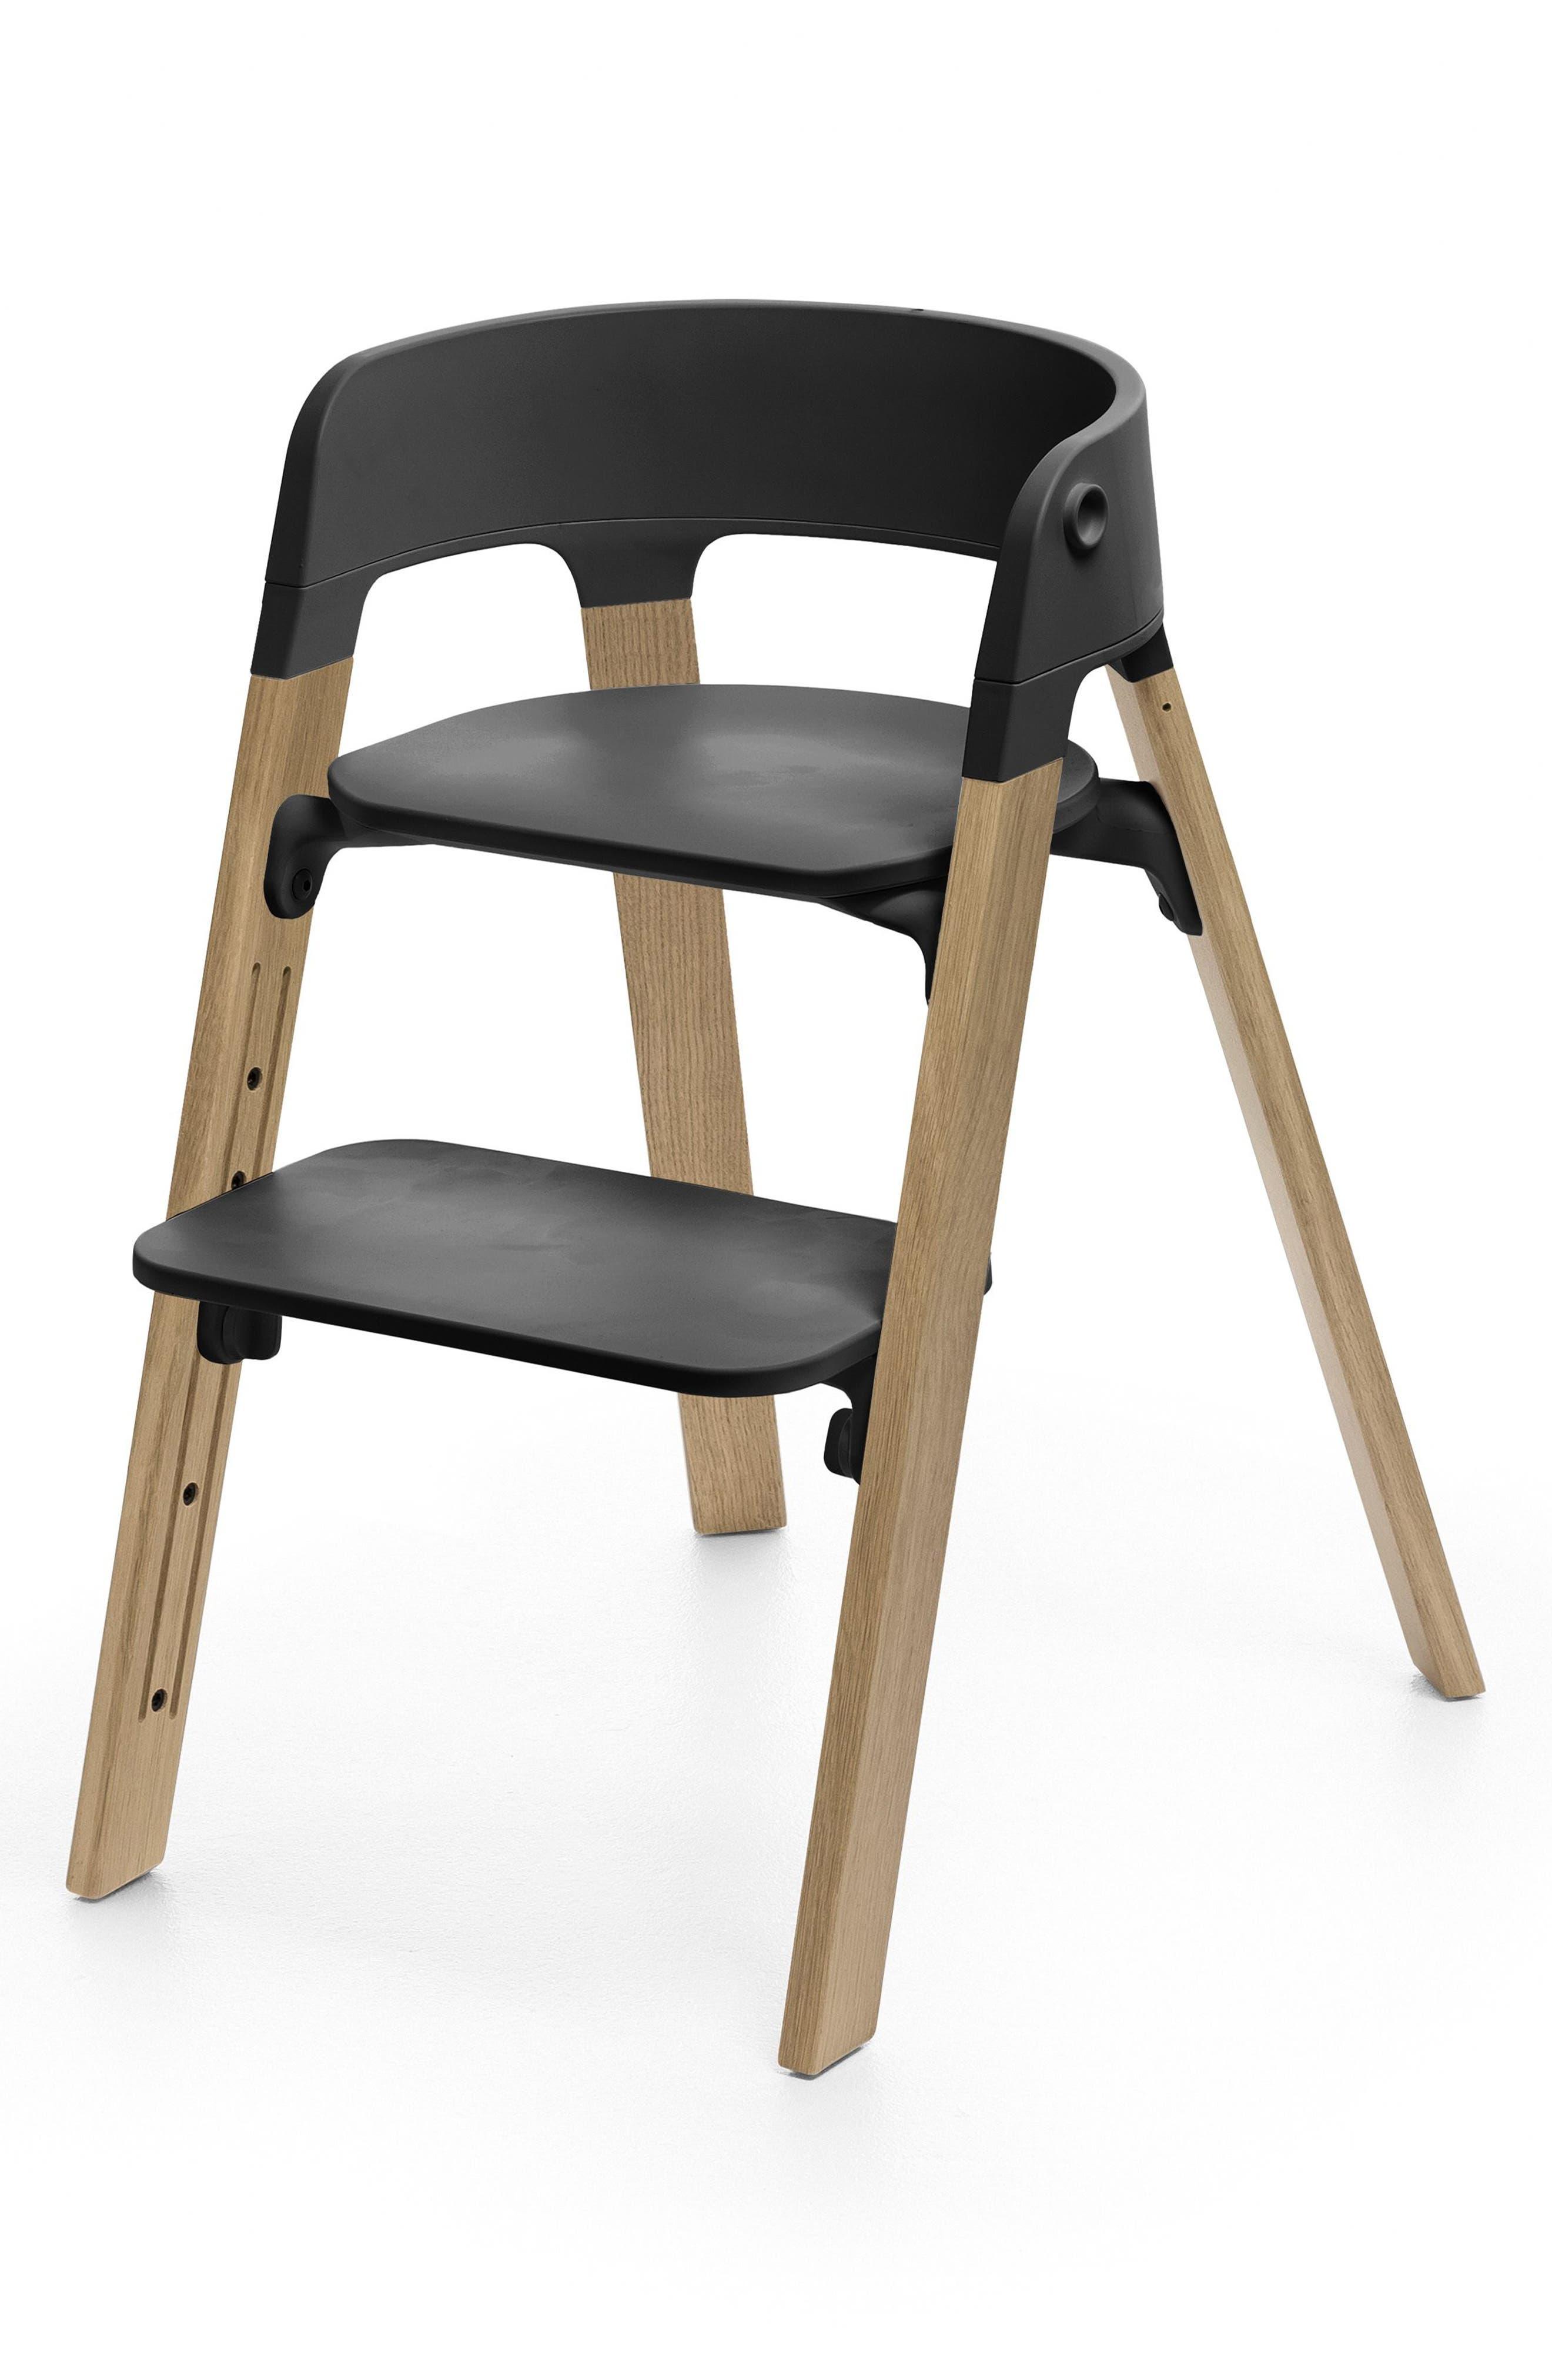 Main Image - Stokke Steps™ Chair